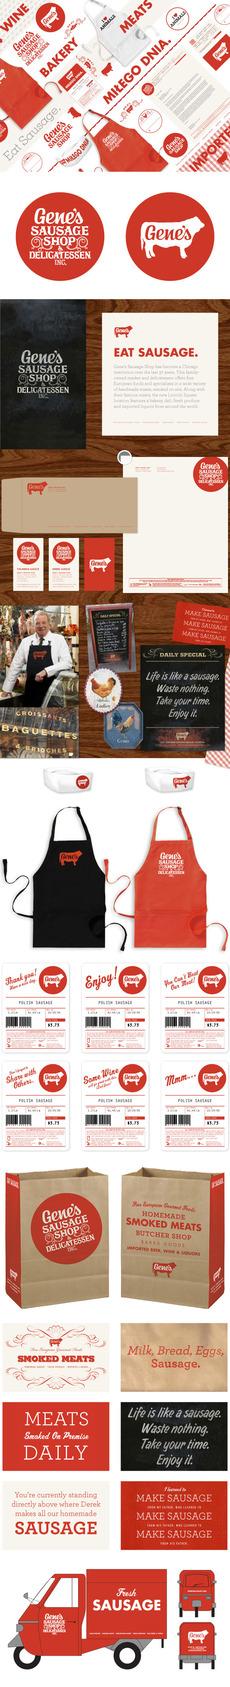 Gene's Sausage Shop - Knoed Creative